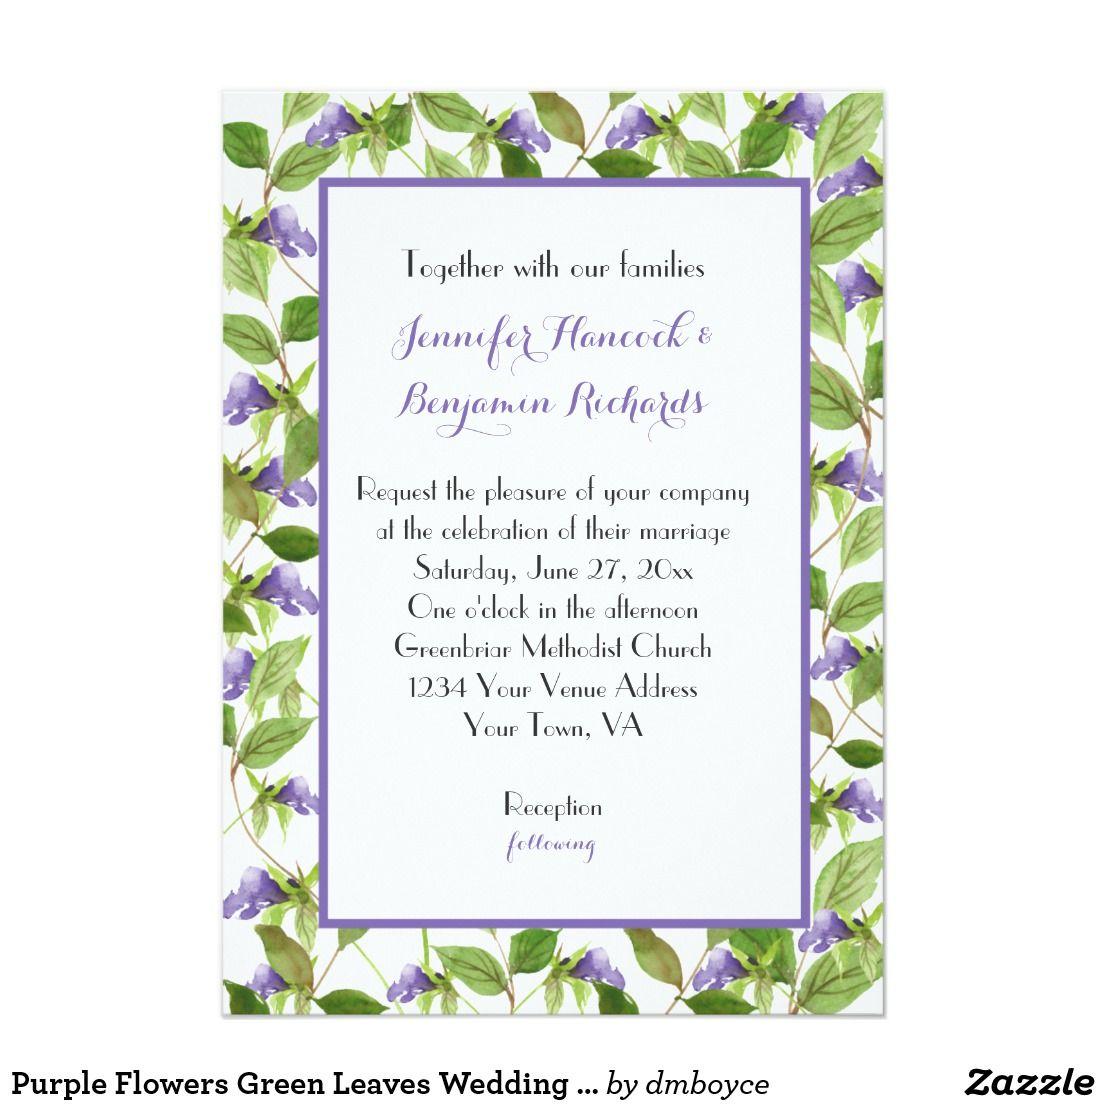 Purple Flowers Green Leaves Wedding Invitations | Watercolor Wedding ...